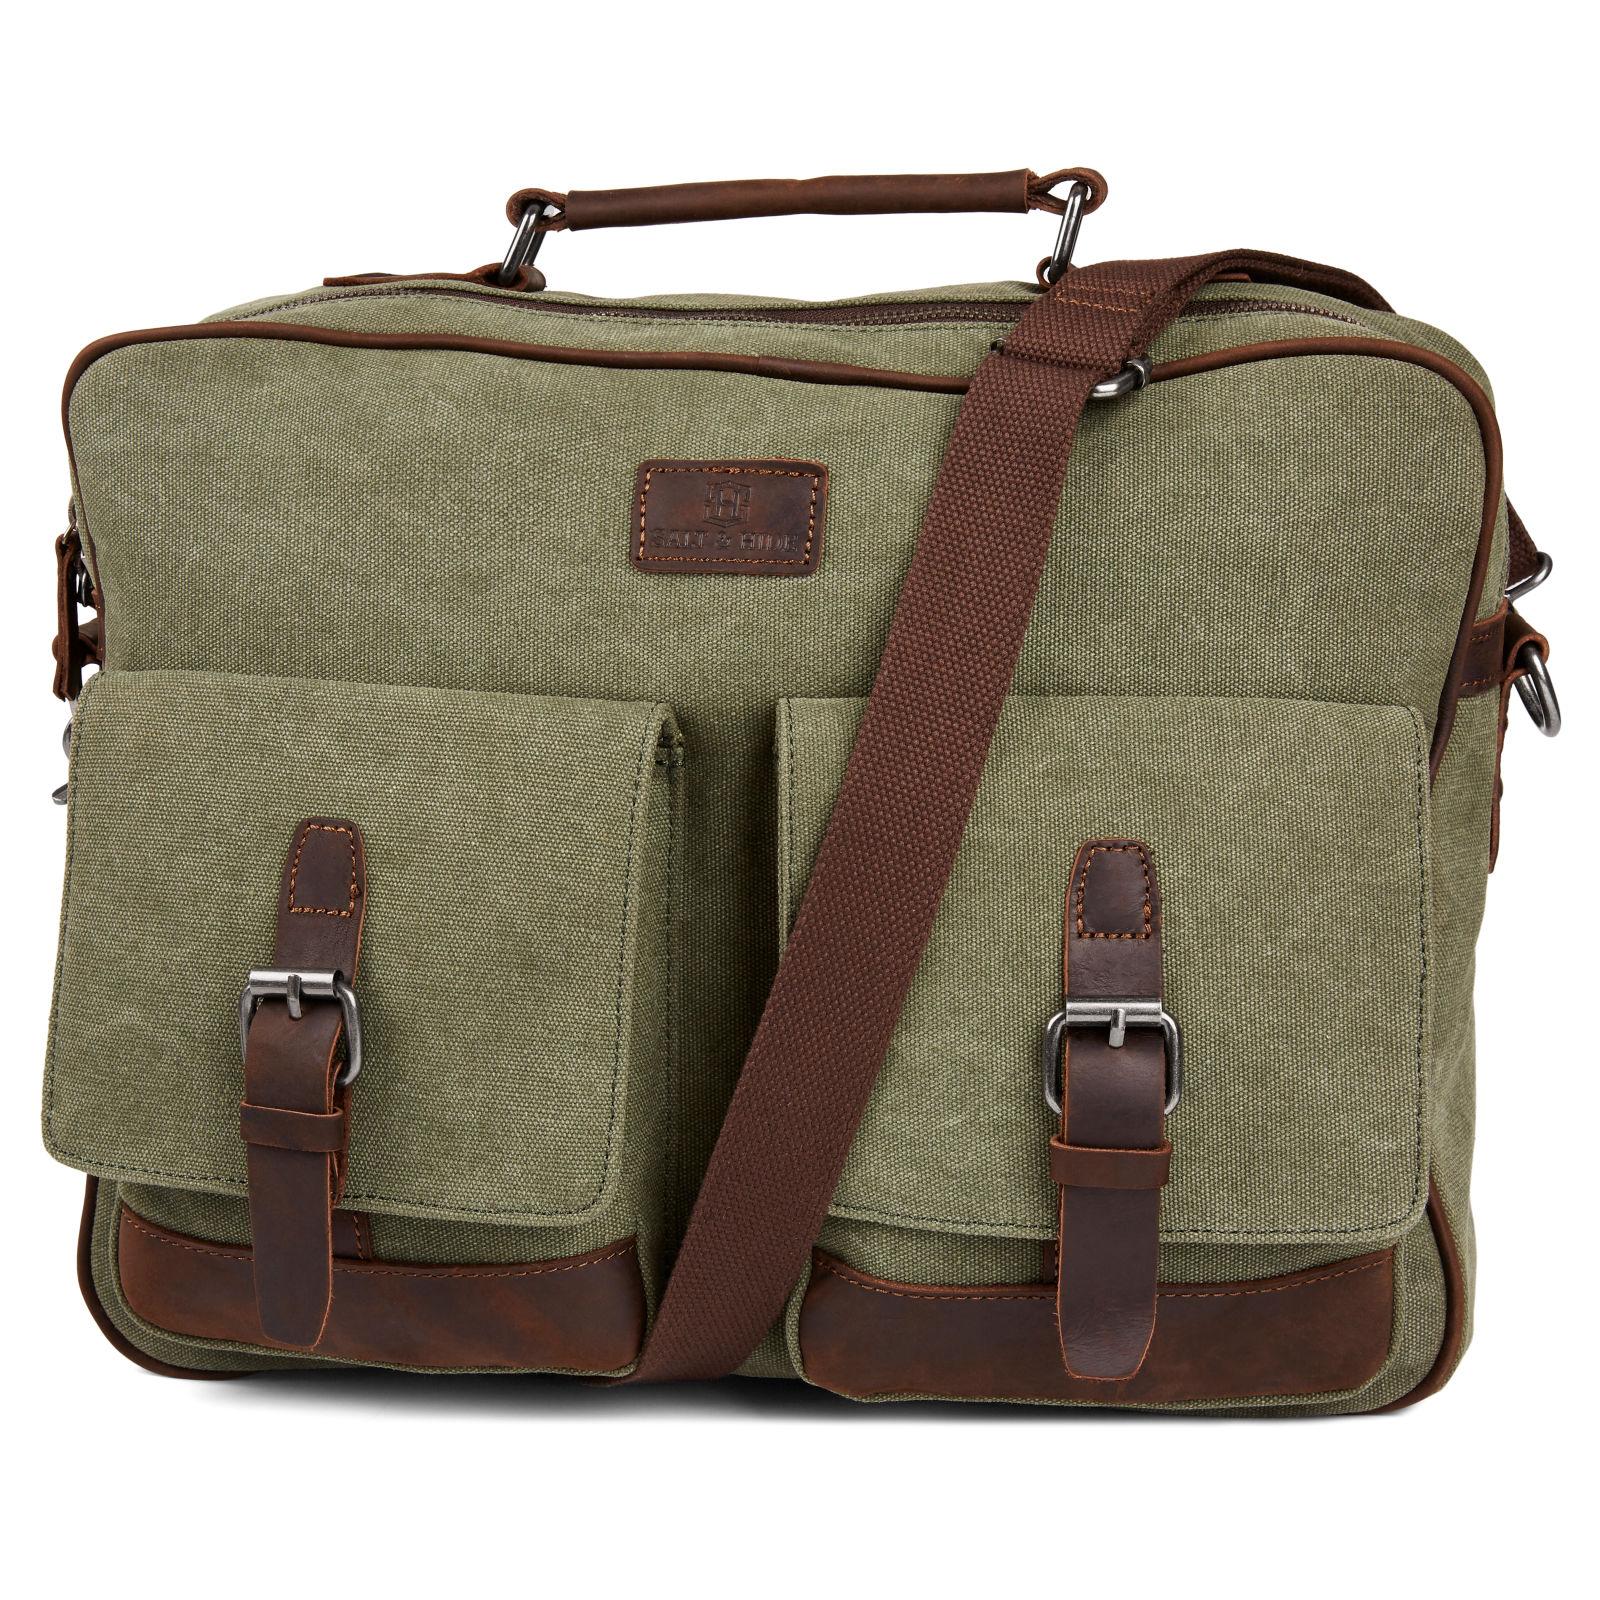 084ceb887d4 Τσάντα Ταχυδρόμου (Messenger Bag) Simon Green & Brown   Γρήγορη αποστολή    Salt & Hide